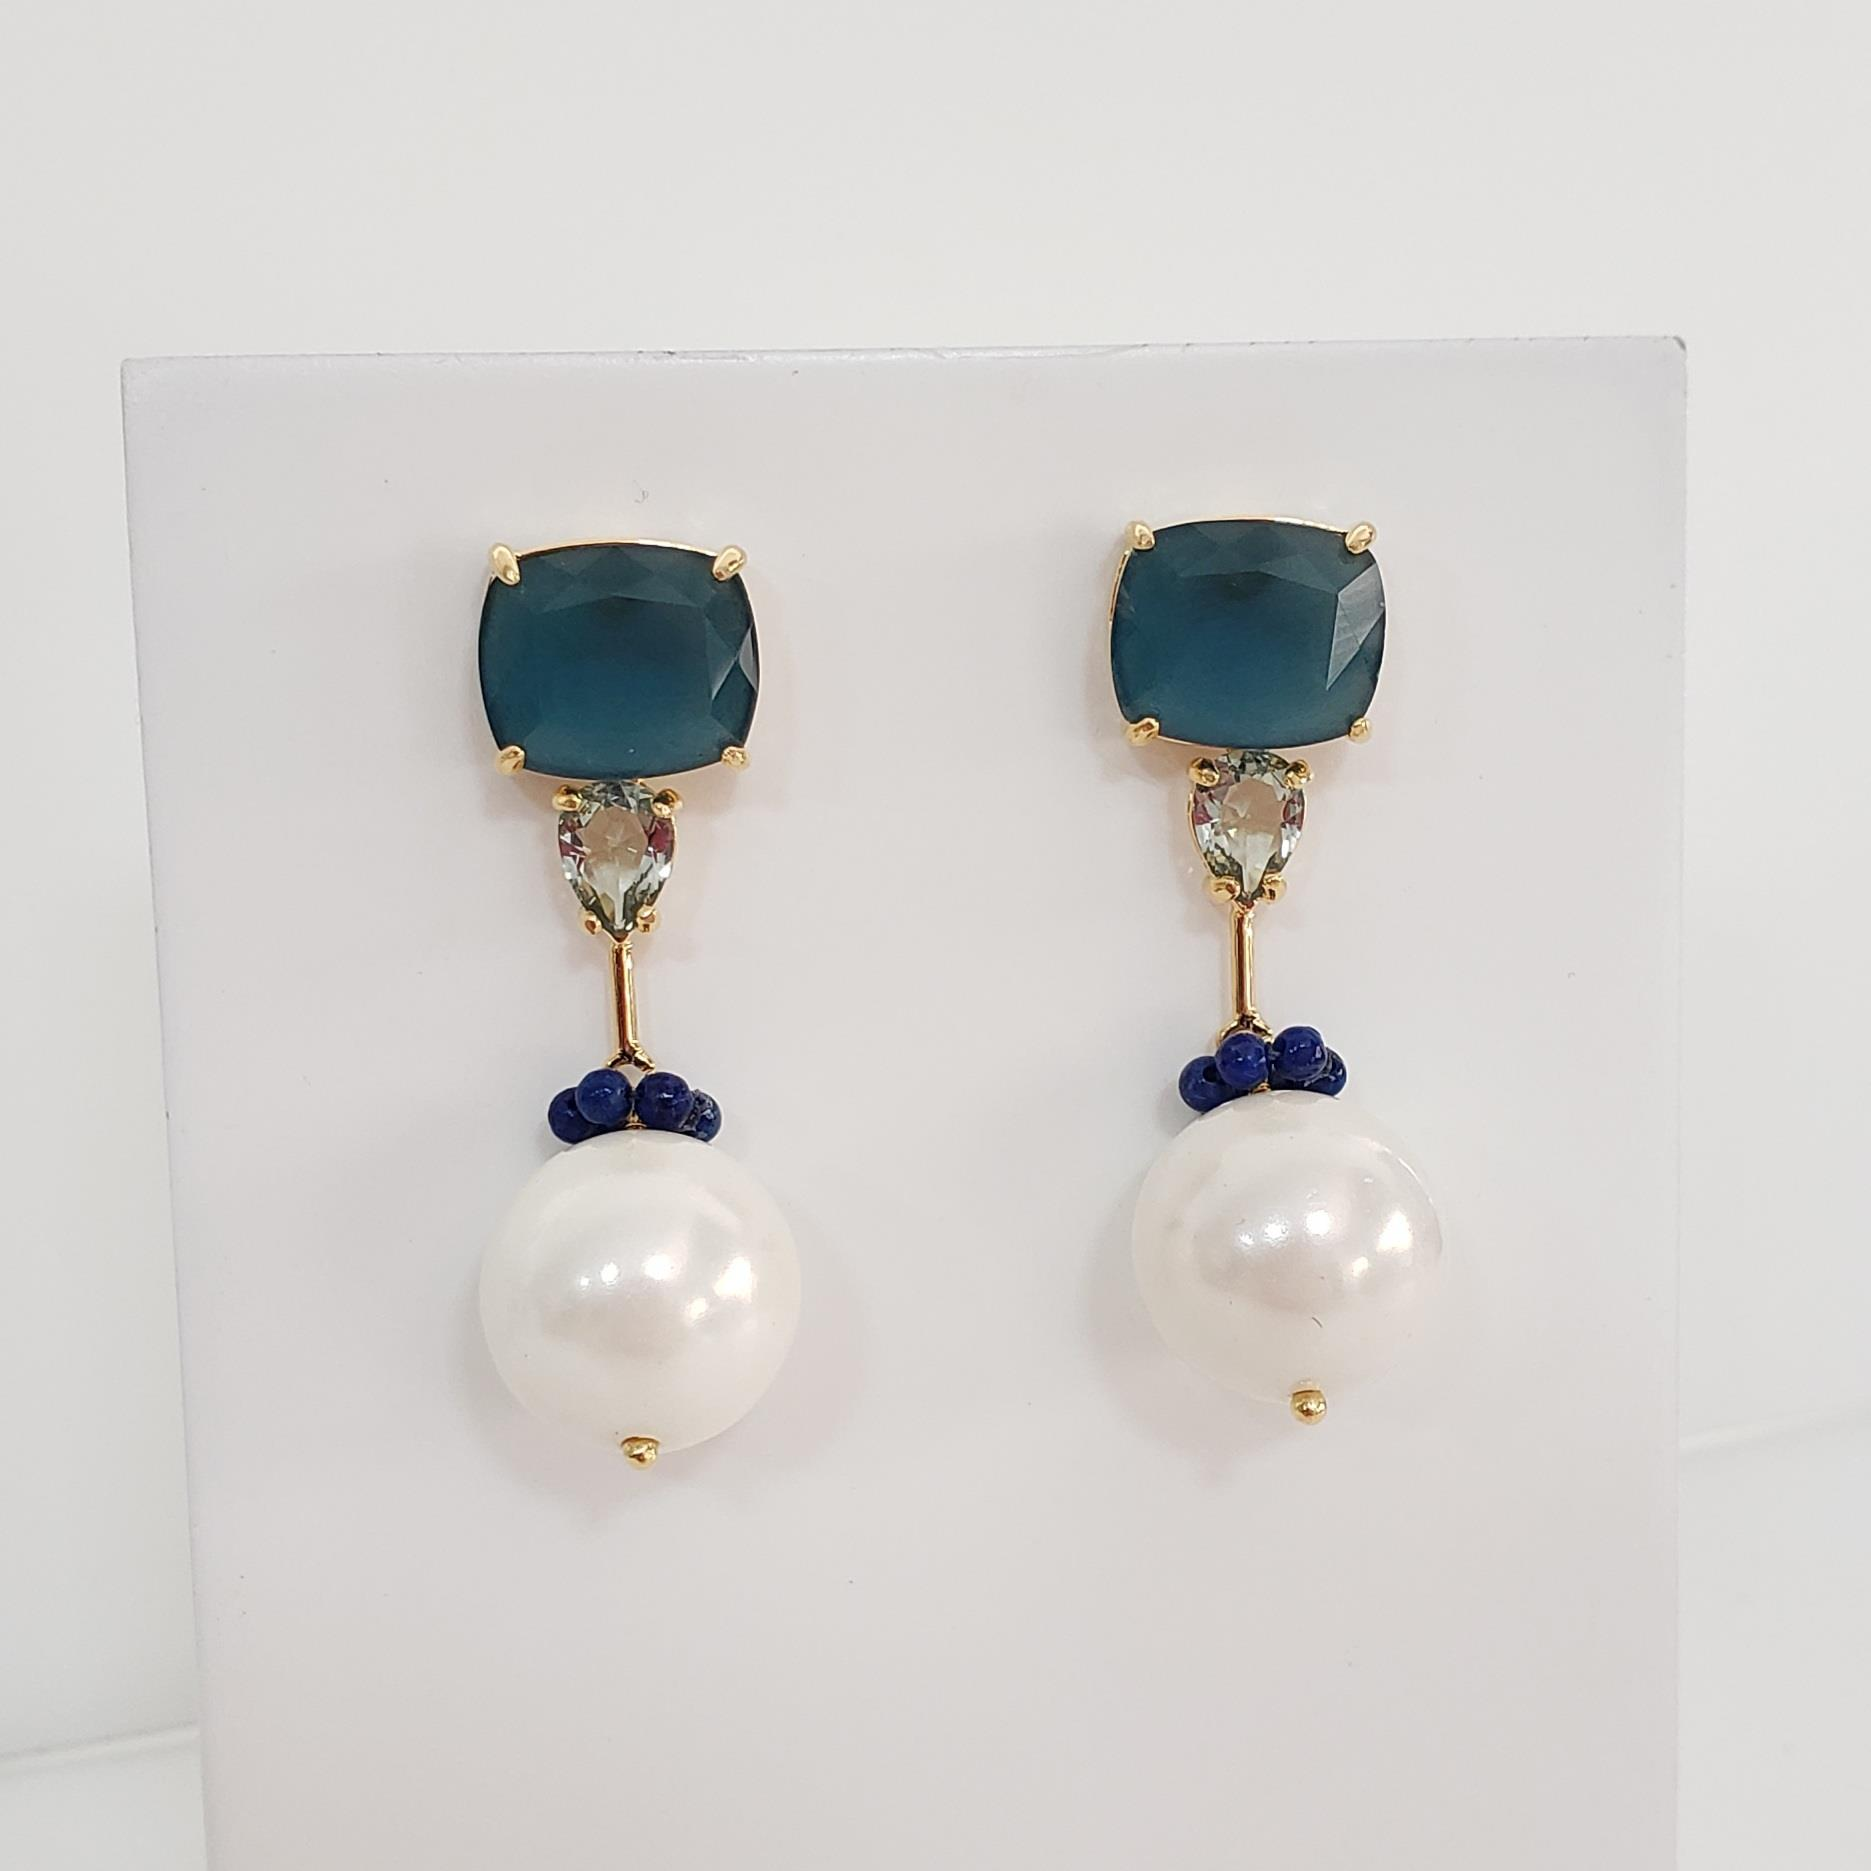 Brinco Base Cristal Azul, Coroinha Lapis Lazulli e Pérola no Banho Ouro 18k Semi Joia